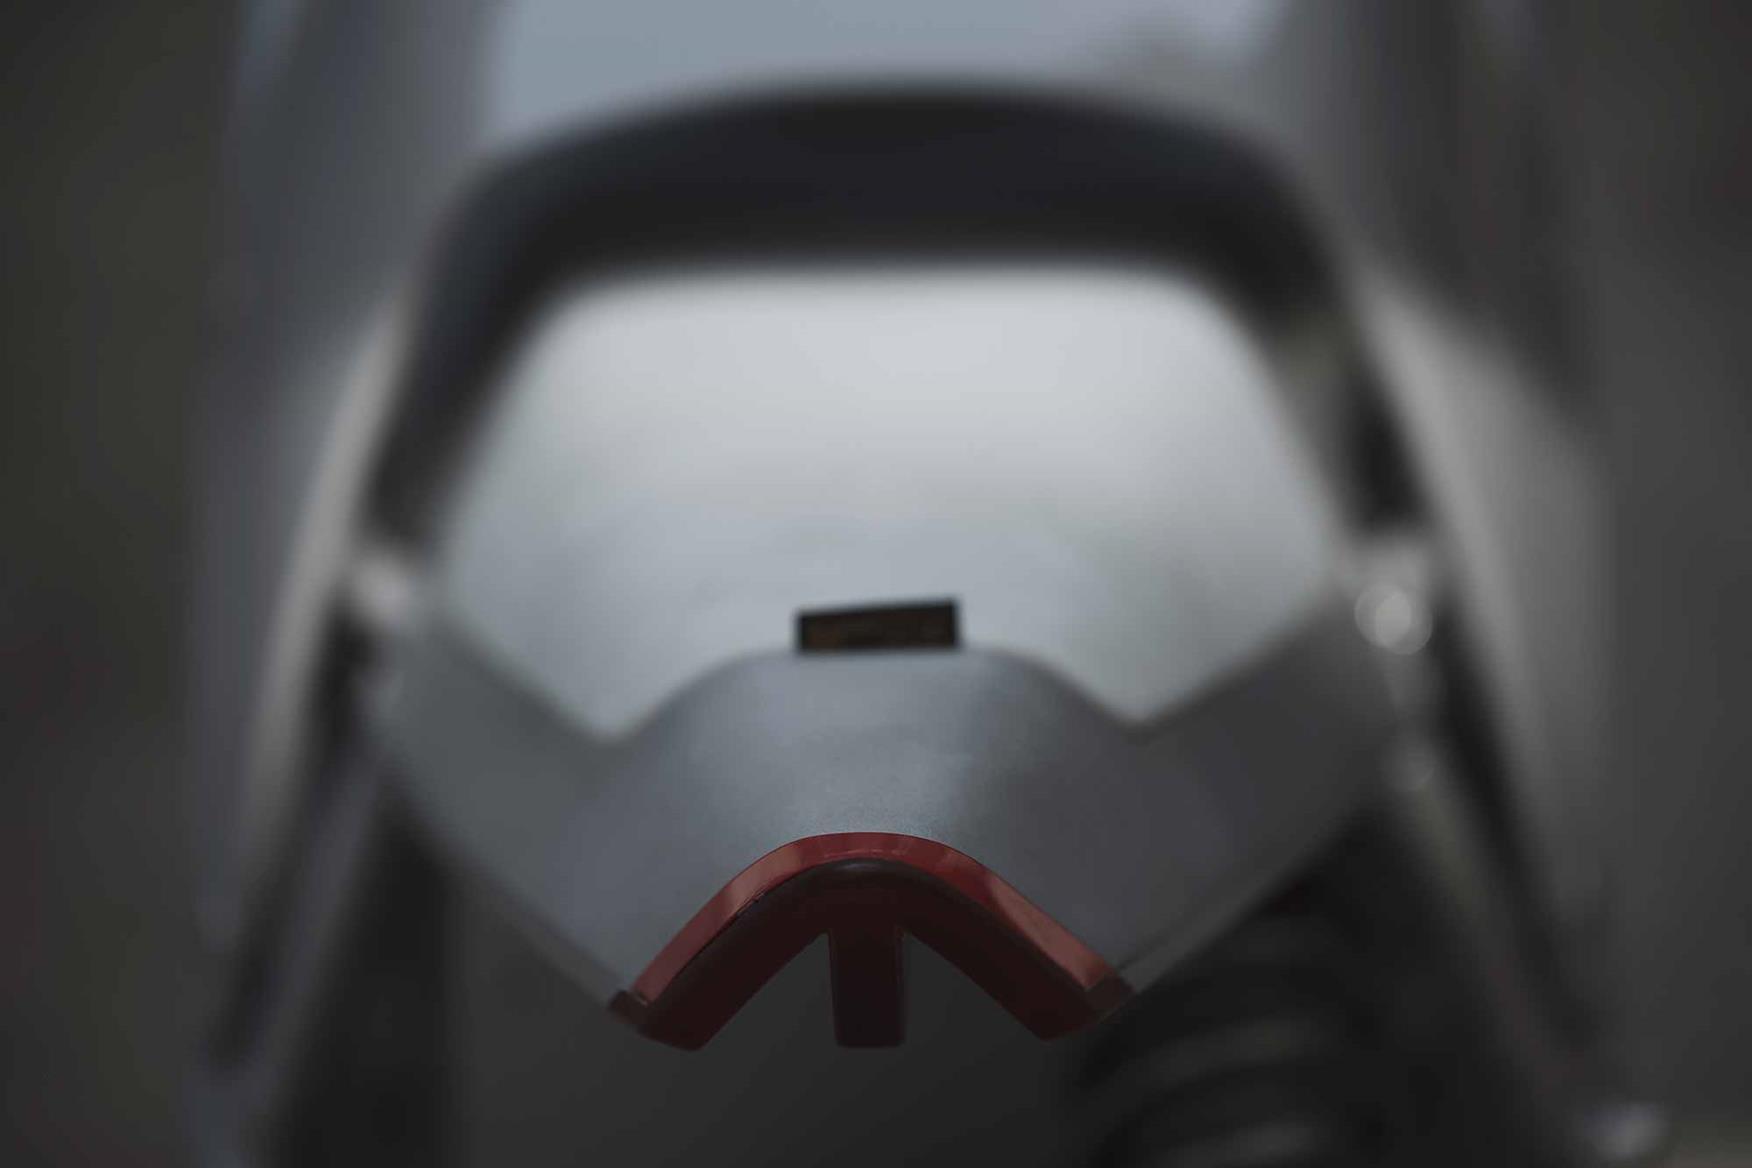 Zero XP rear LED light. Credit: Ludovic Robert.